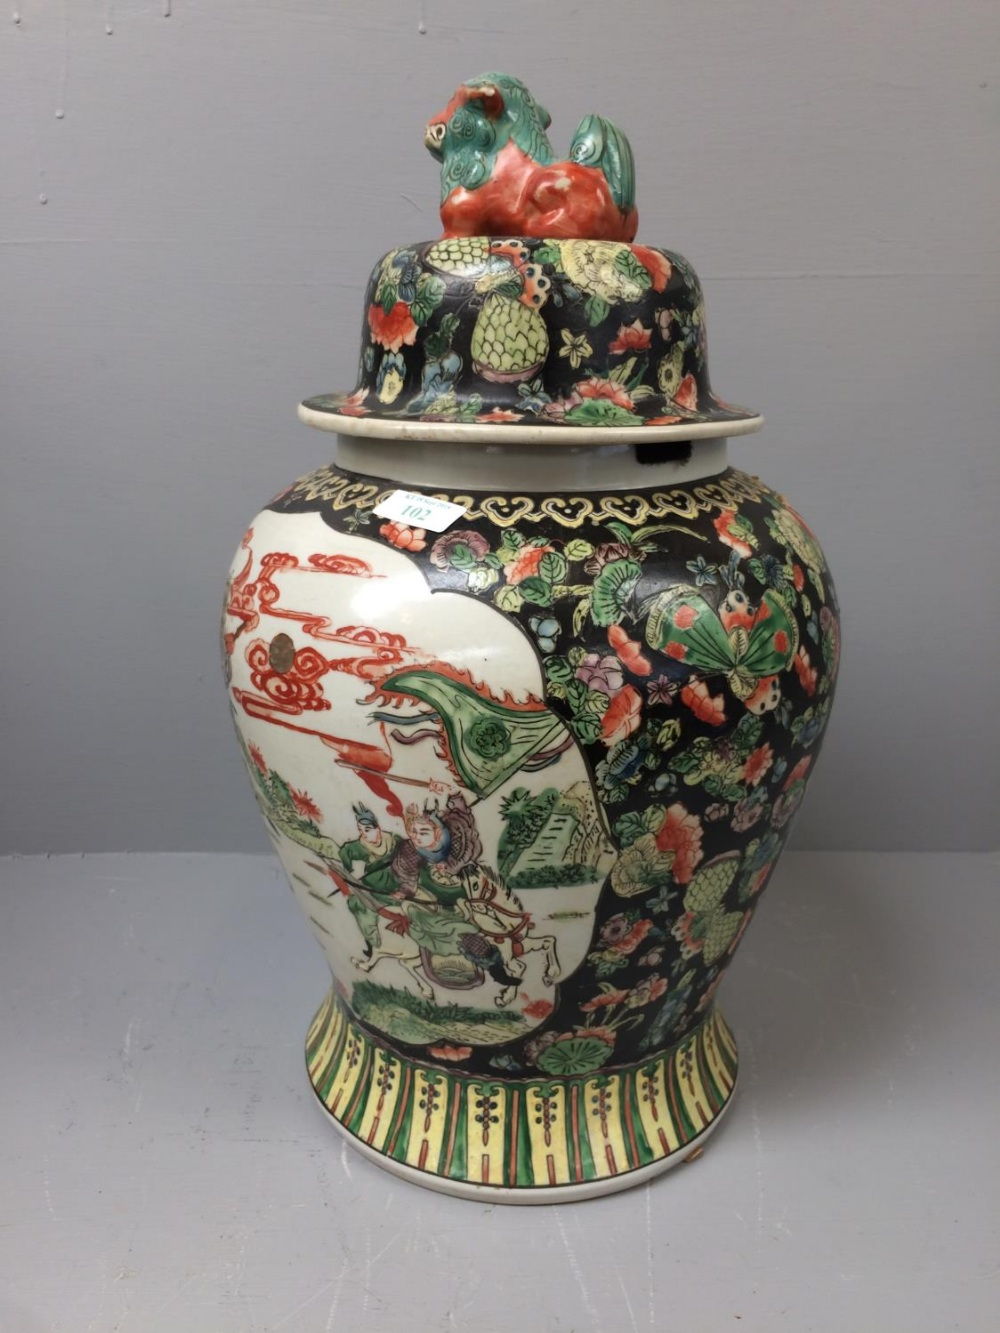 Lot 118 - Large lidded Chinese jar